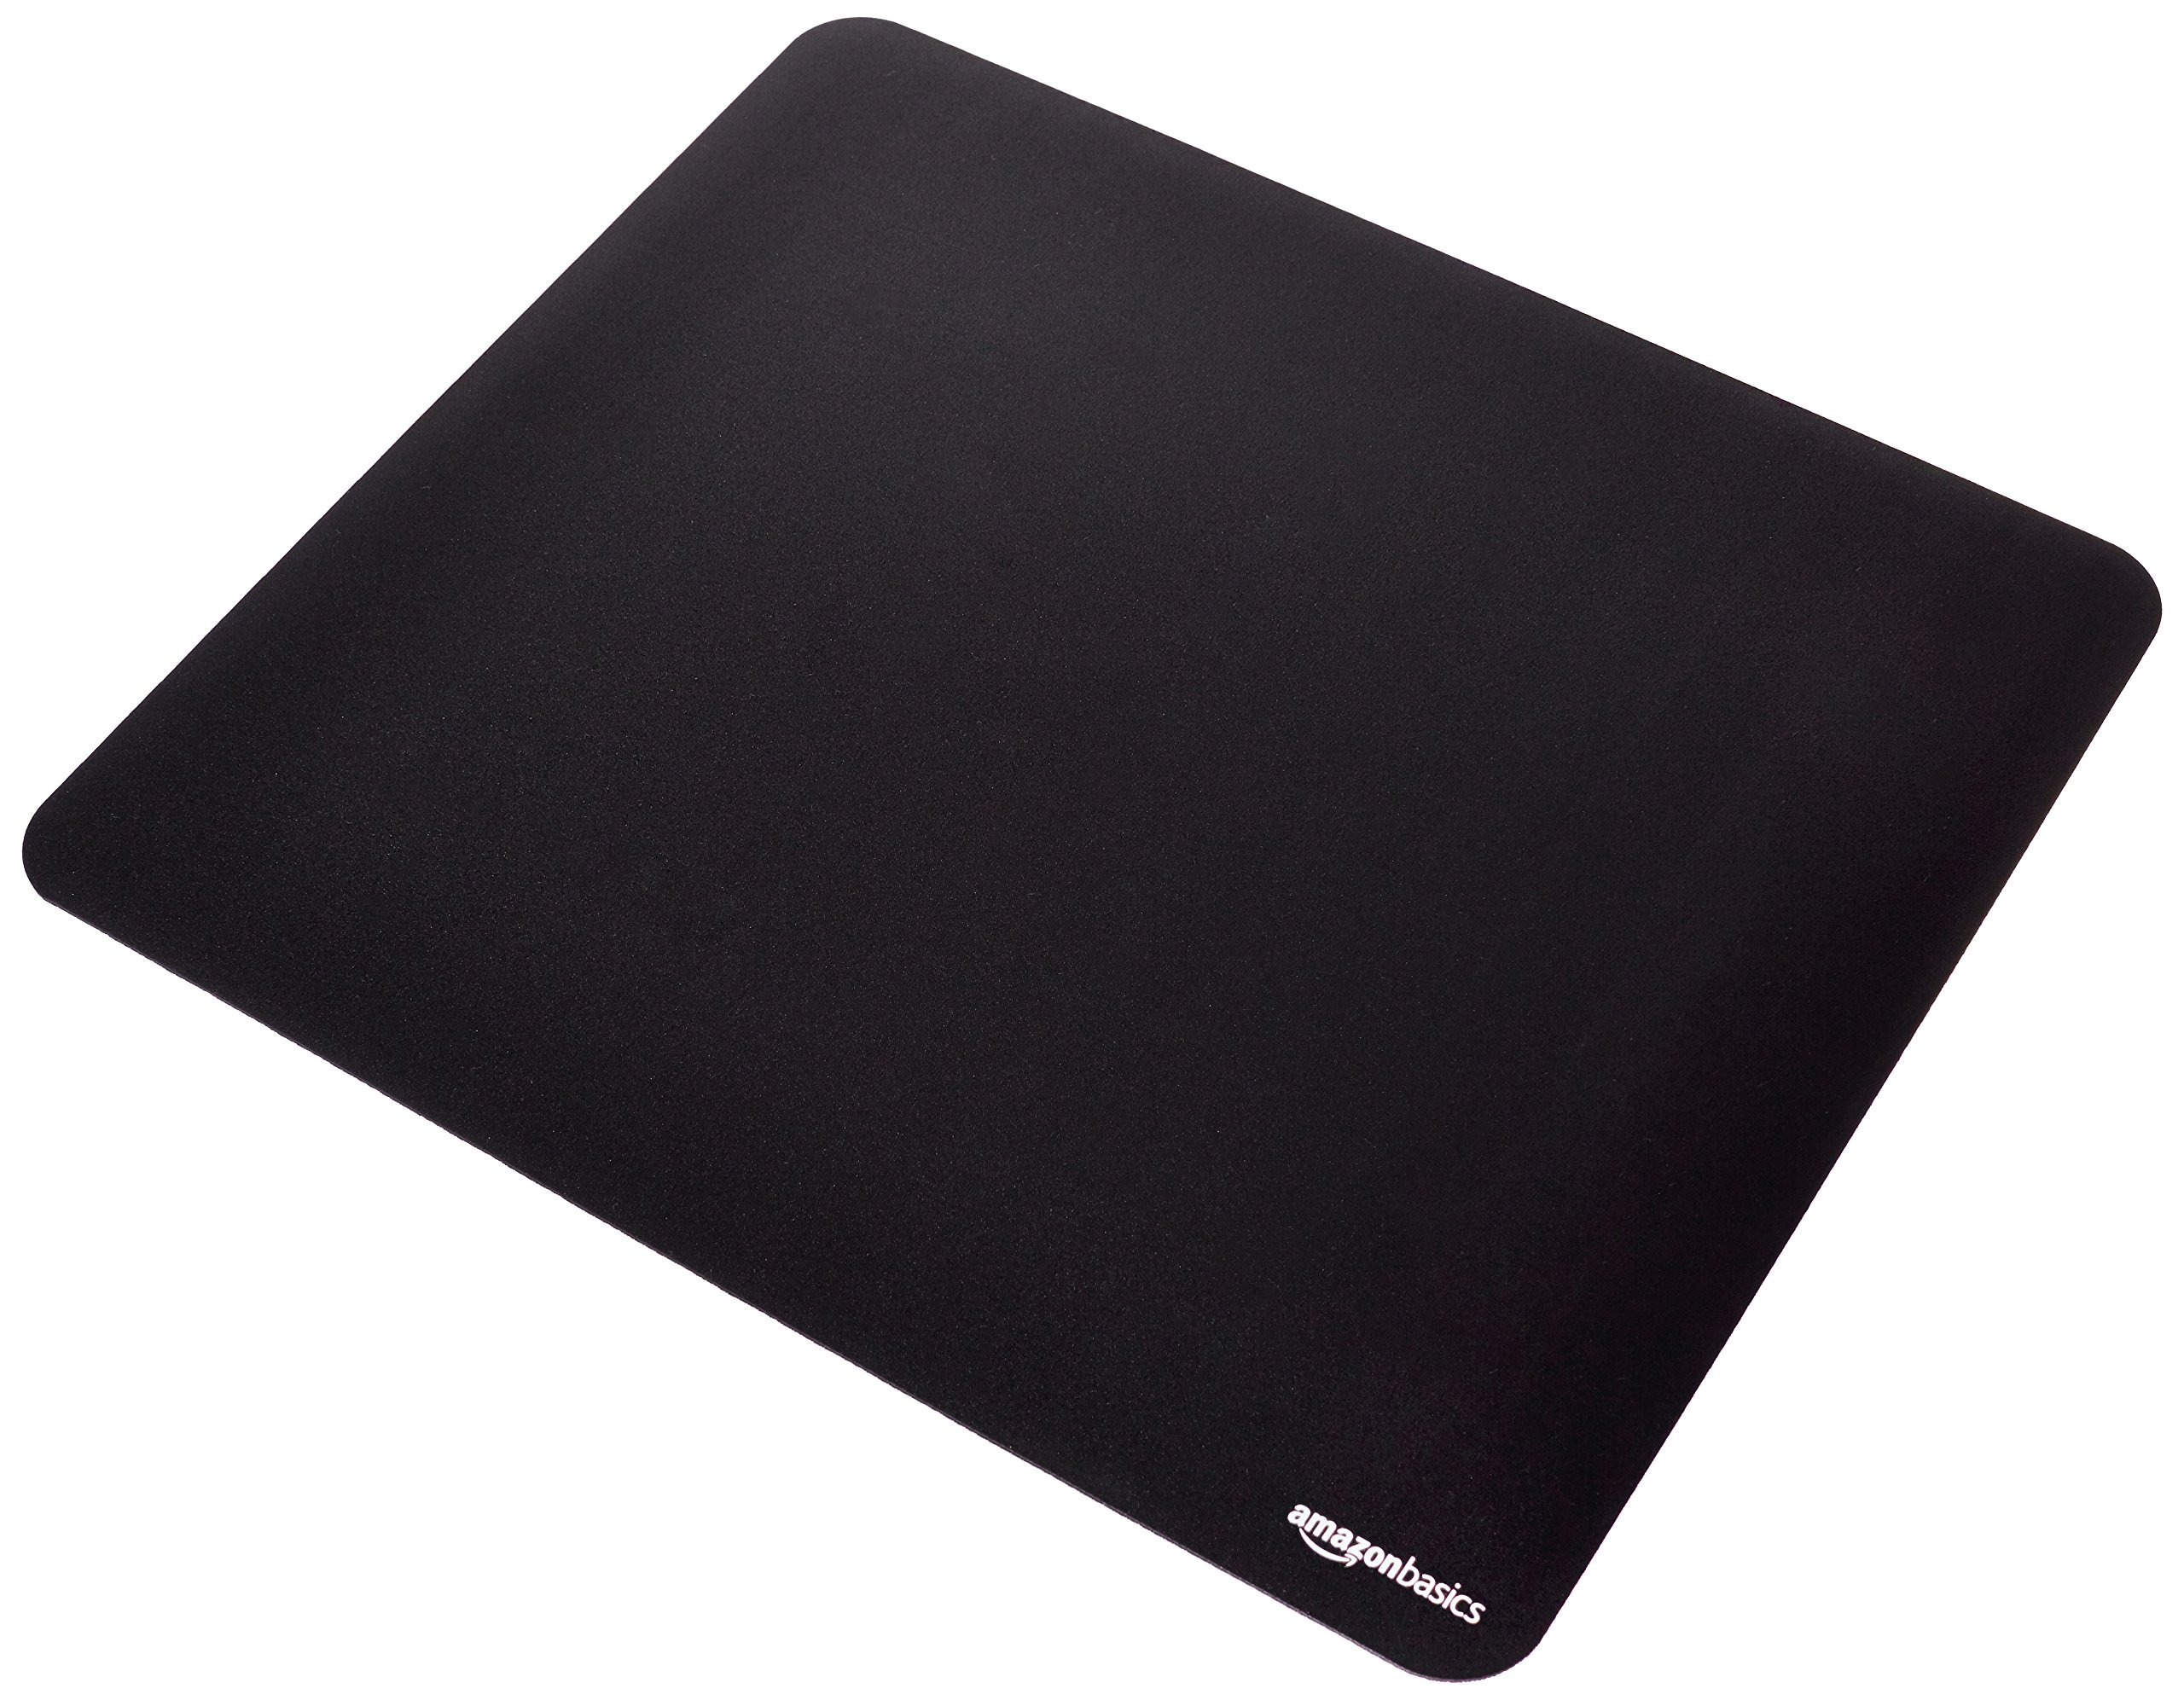 AmazonBasics Extended Gaming Mouse Pad,Black